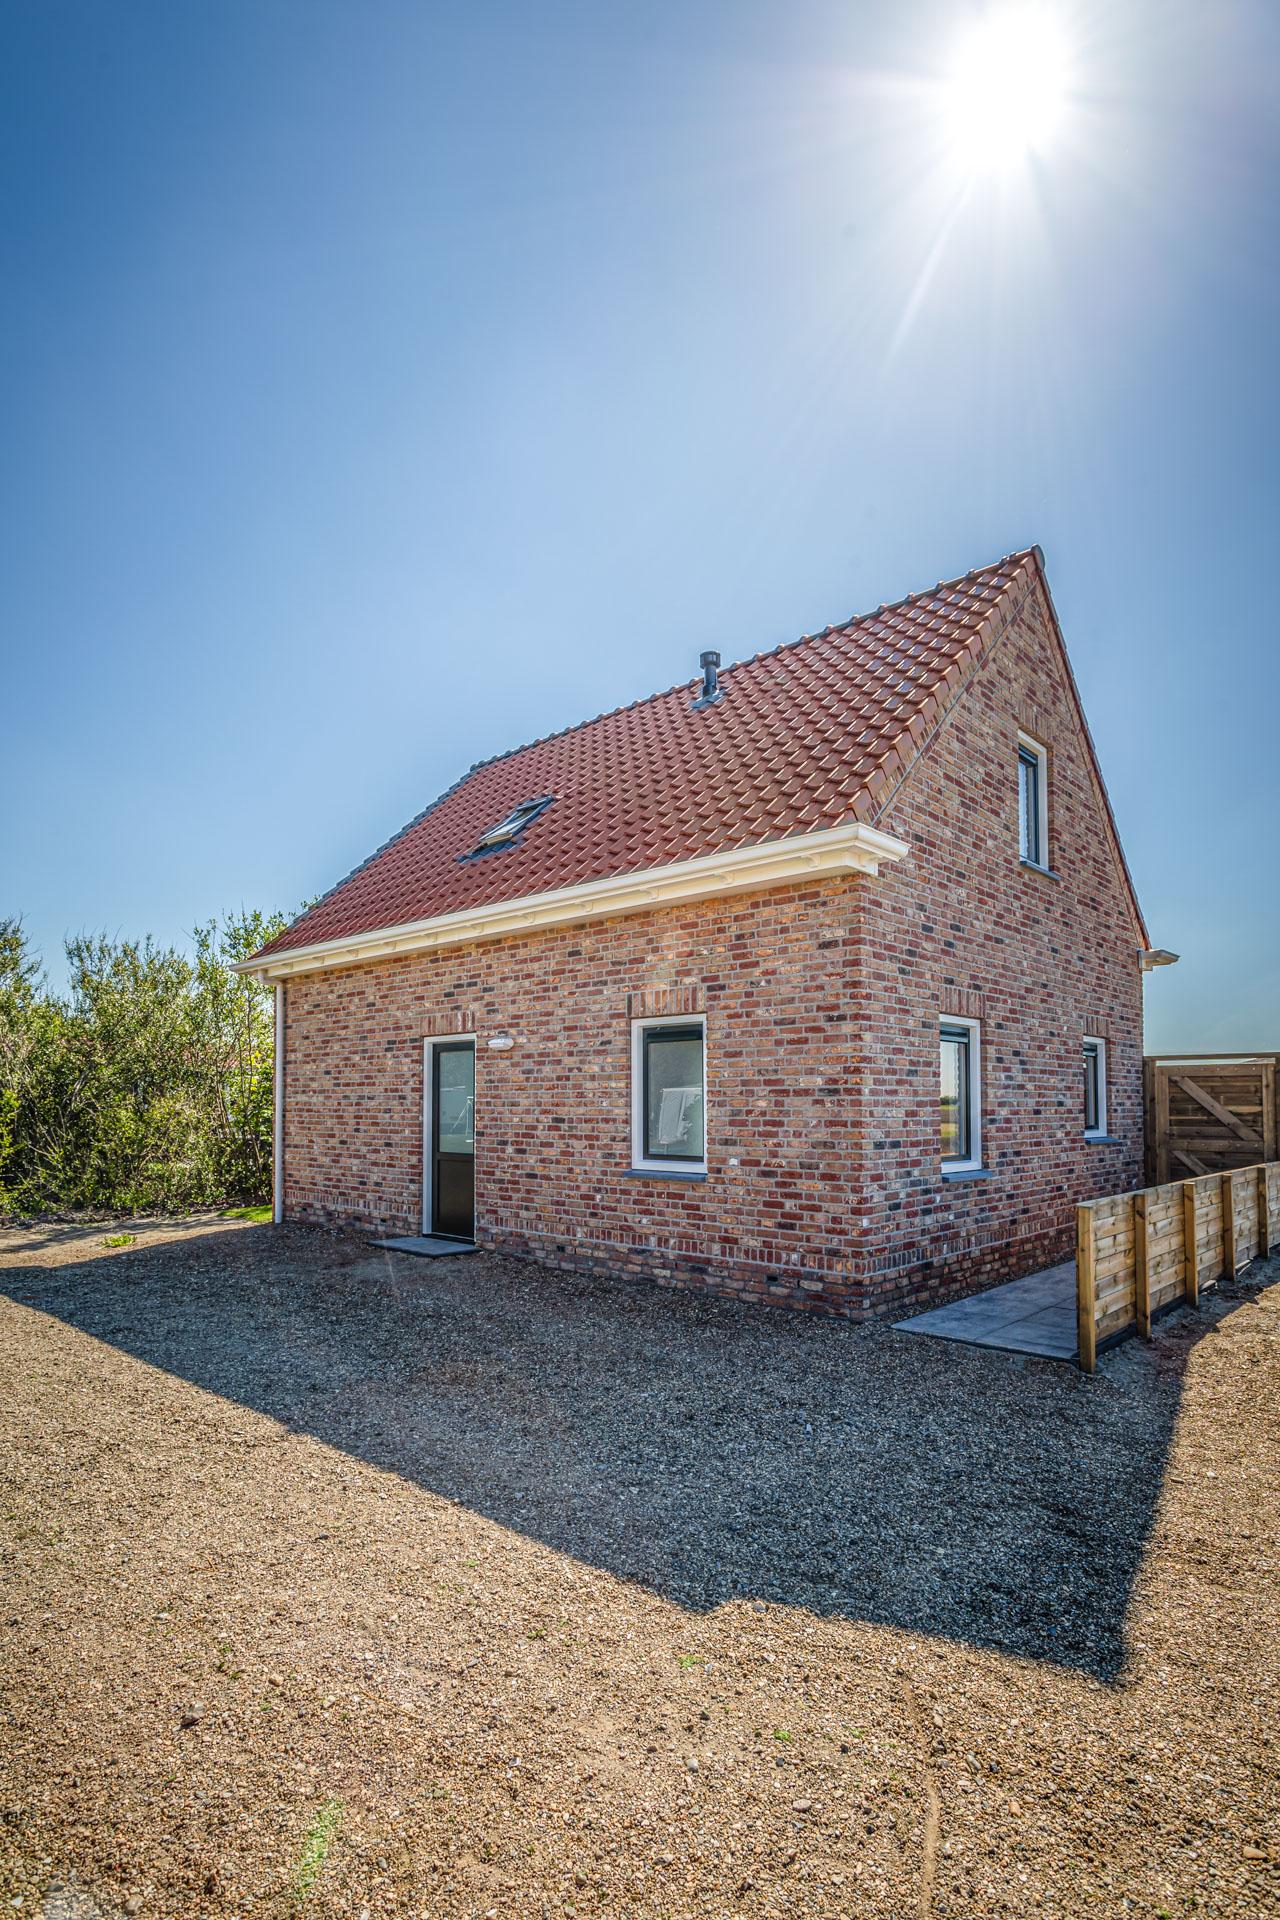 Ferienhaus in Domburg - Camping Noordduin Domburg